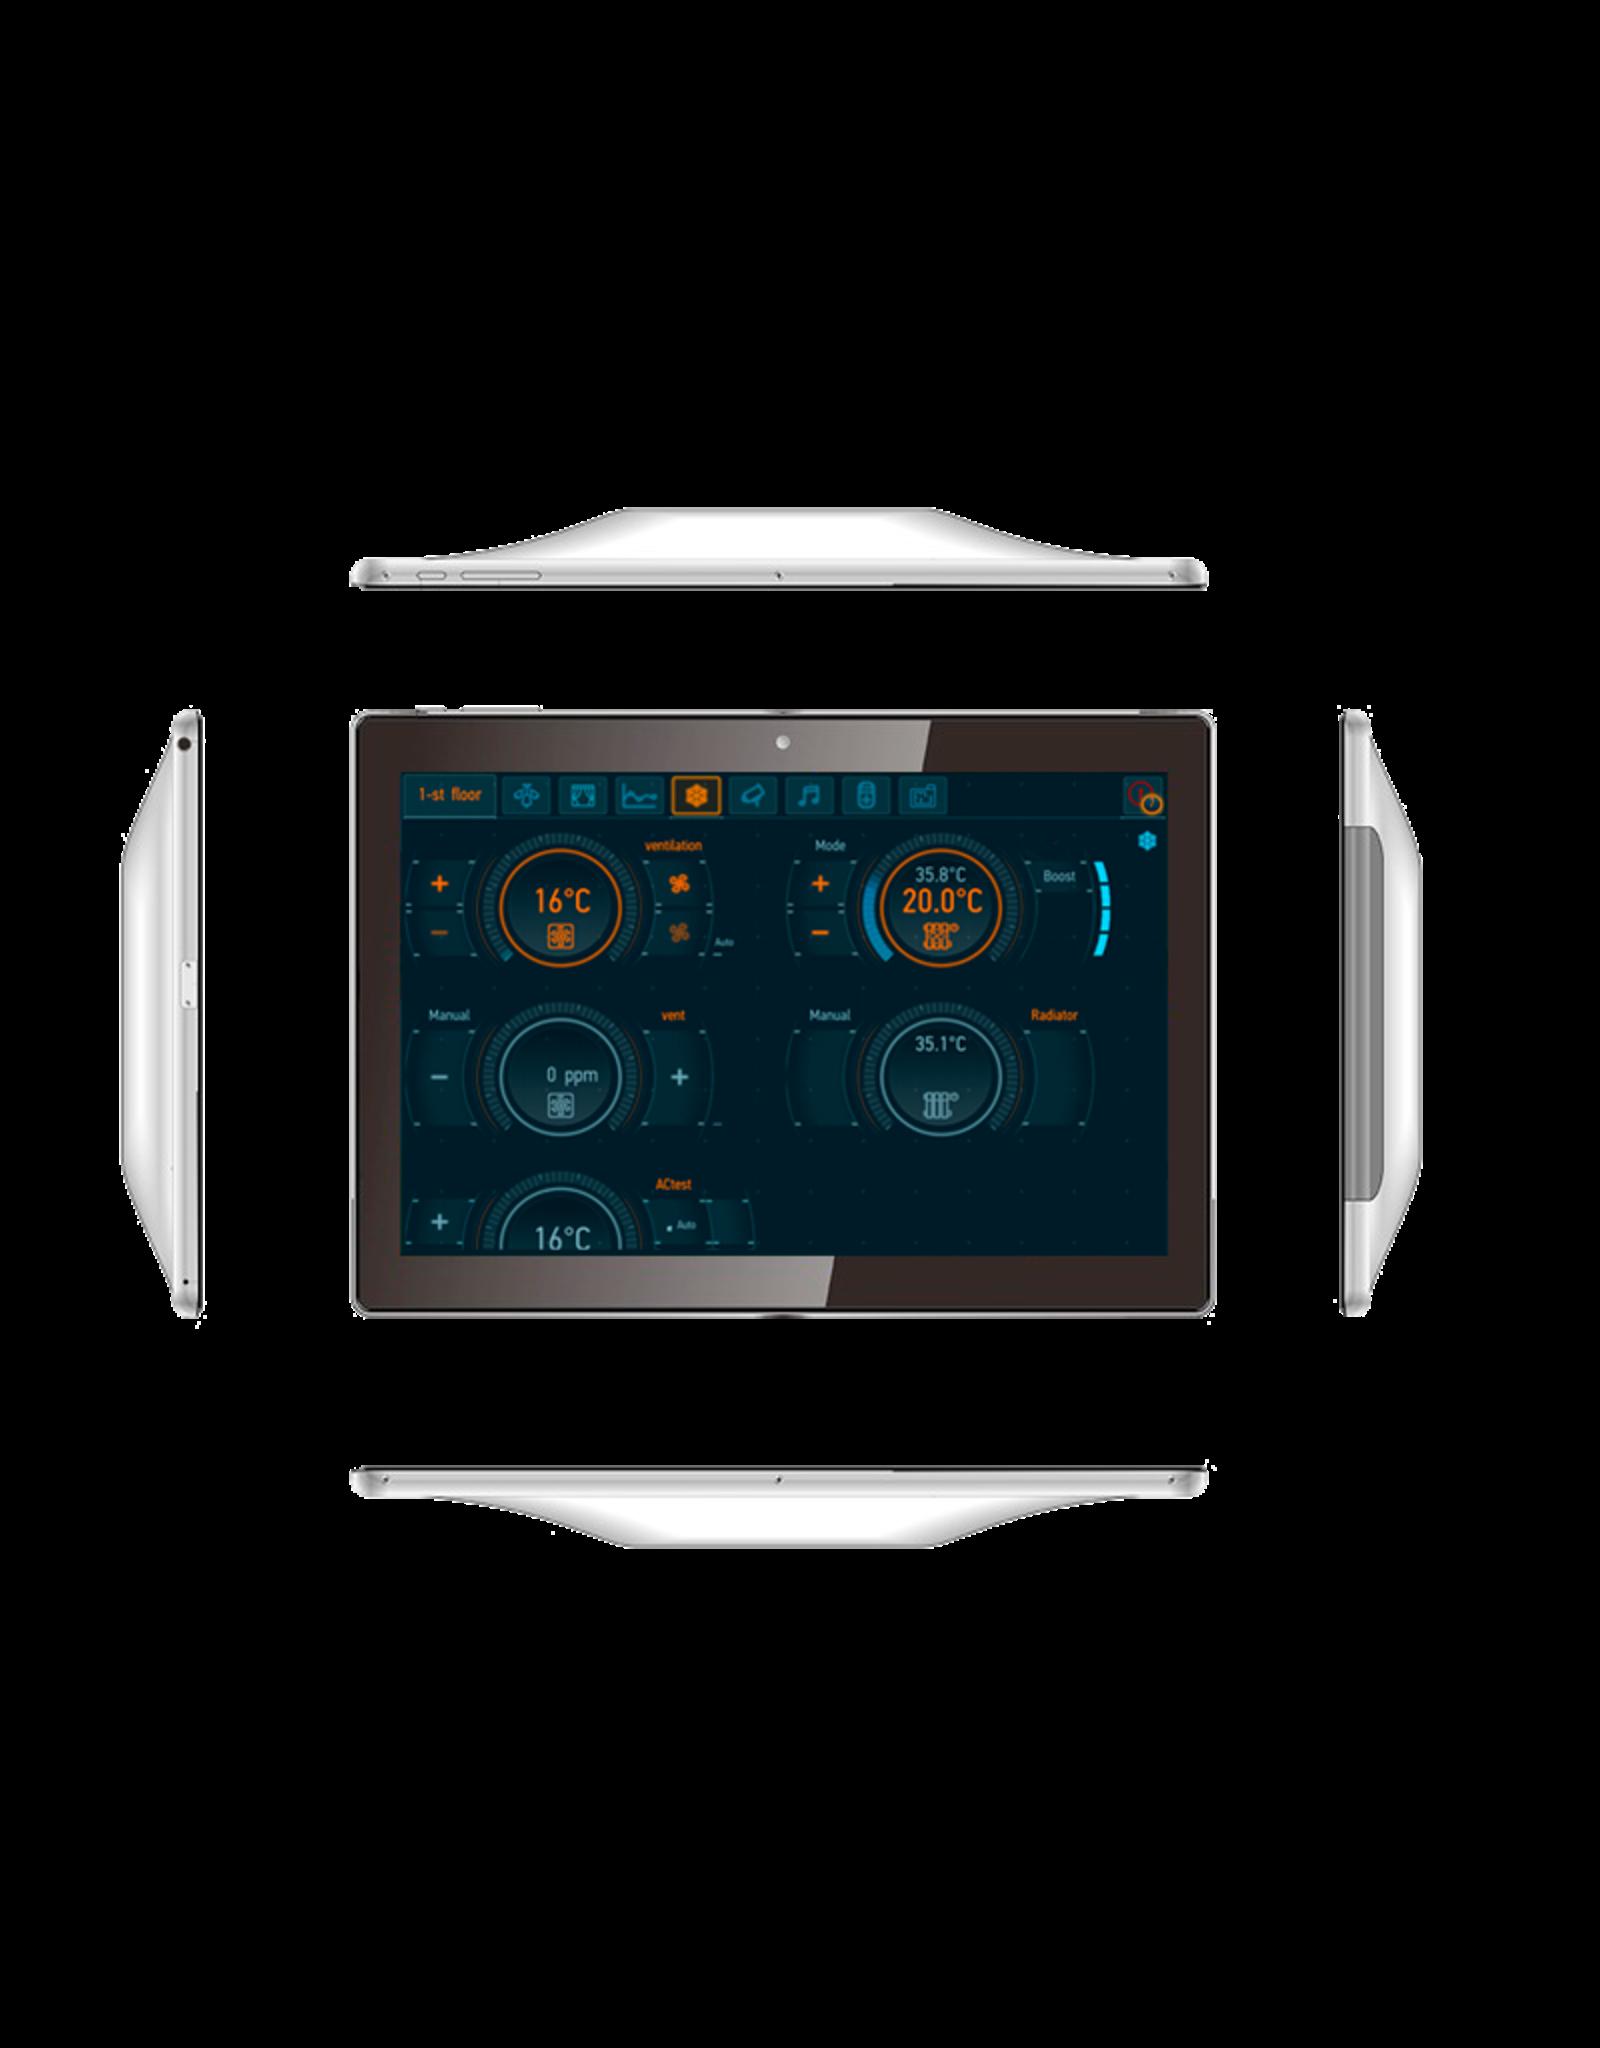 Larnitech Larnitech Android based wall panel